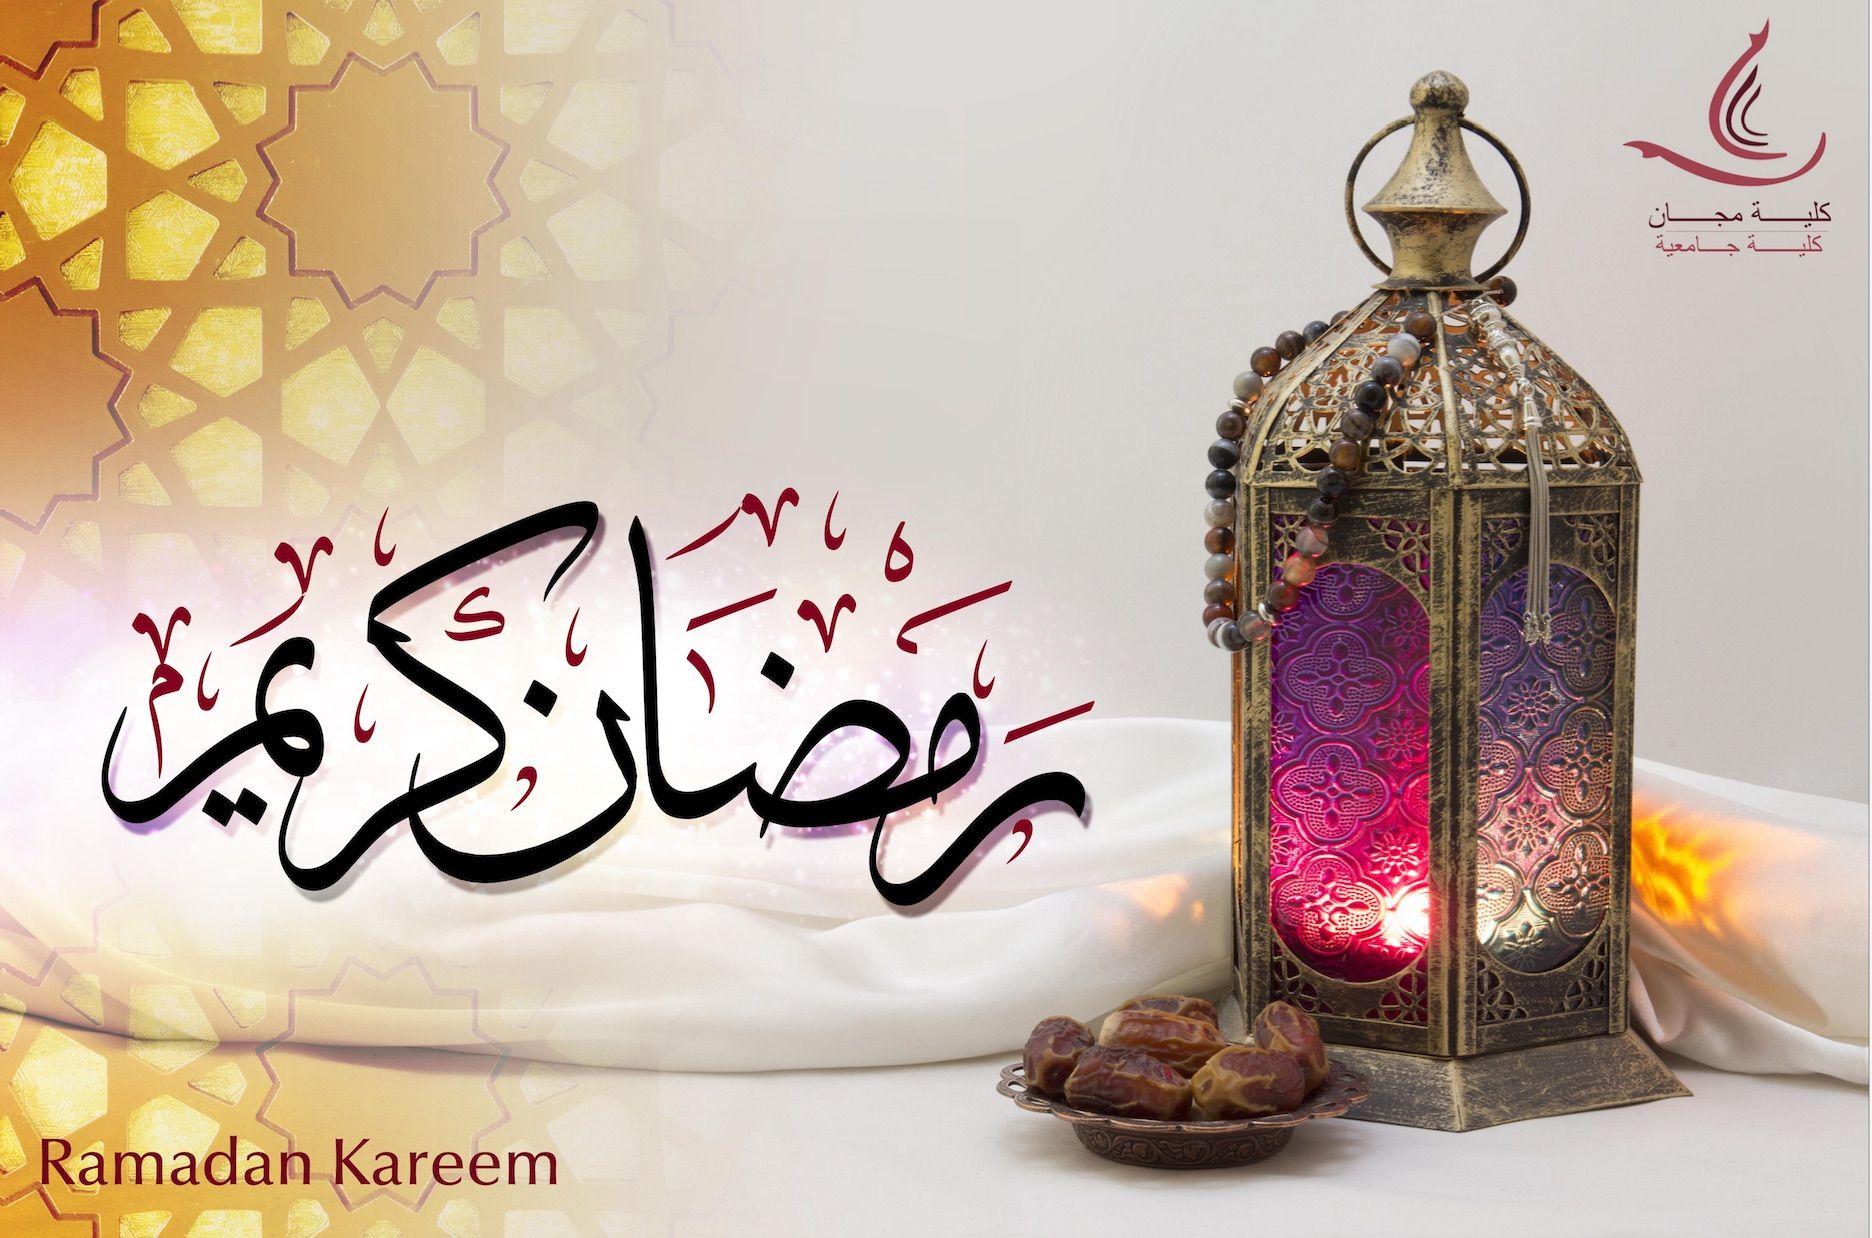 خلفيات صور رمضان كريم 2020 Ramazan Cennet Islam